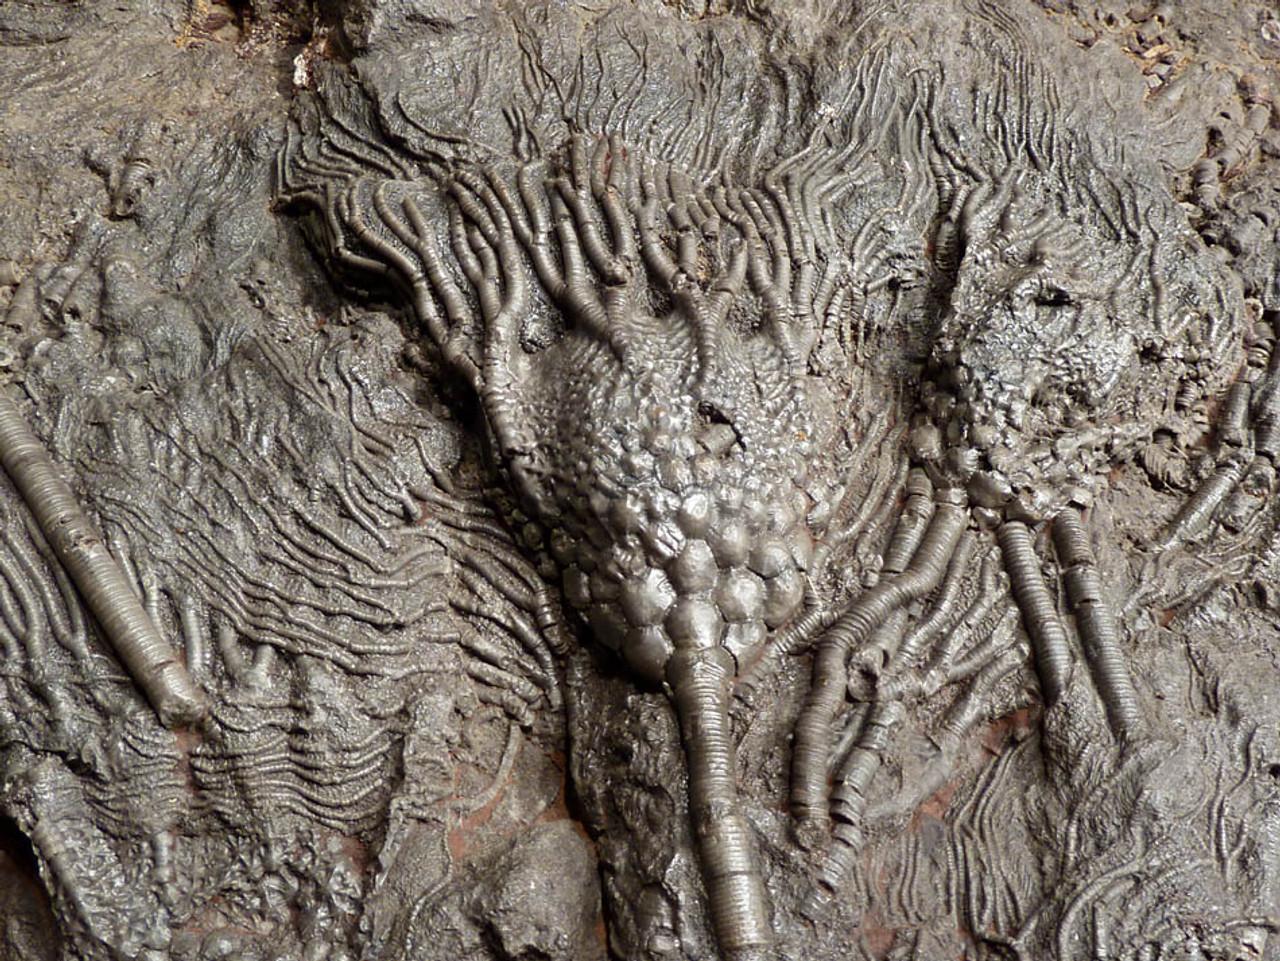 LARGE INTERIOR DESIGN SHOWPIECE FOSSIL OF PREHISTORIC SEA LILY CRINOIDS FROM 420 MILLION YEARS AGO *CRI031